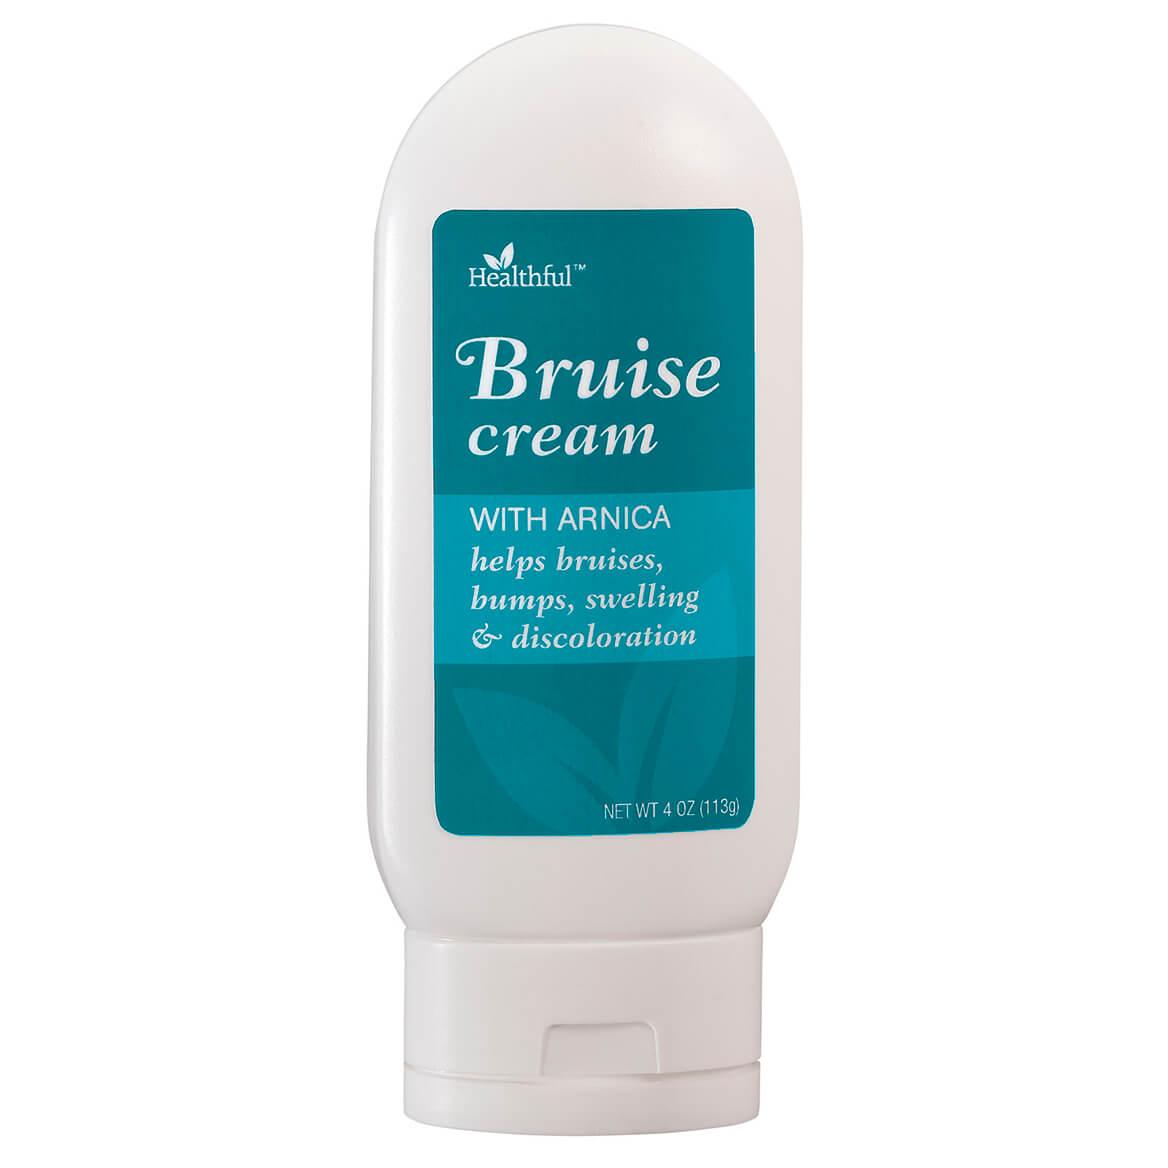 Healthful™ Bruise Cream-346144